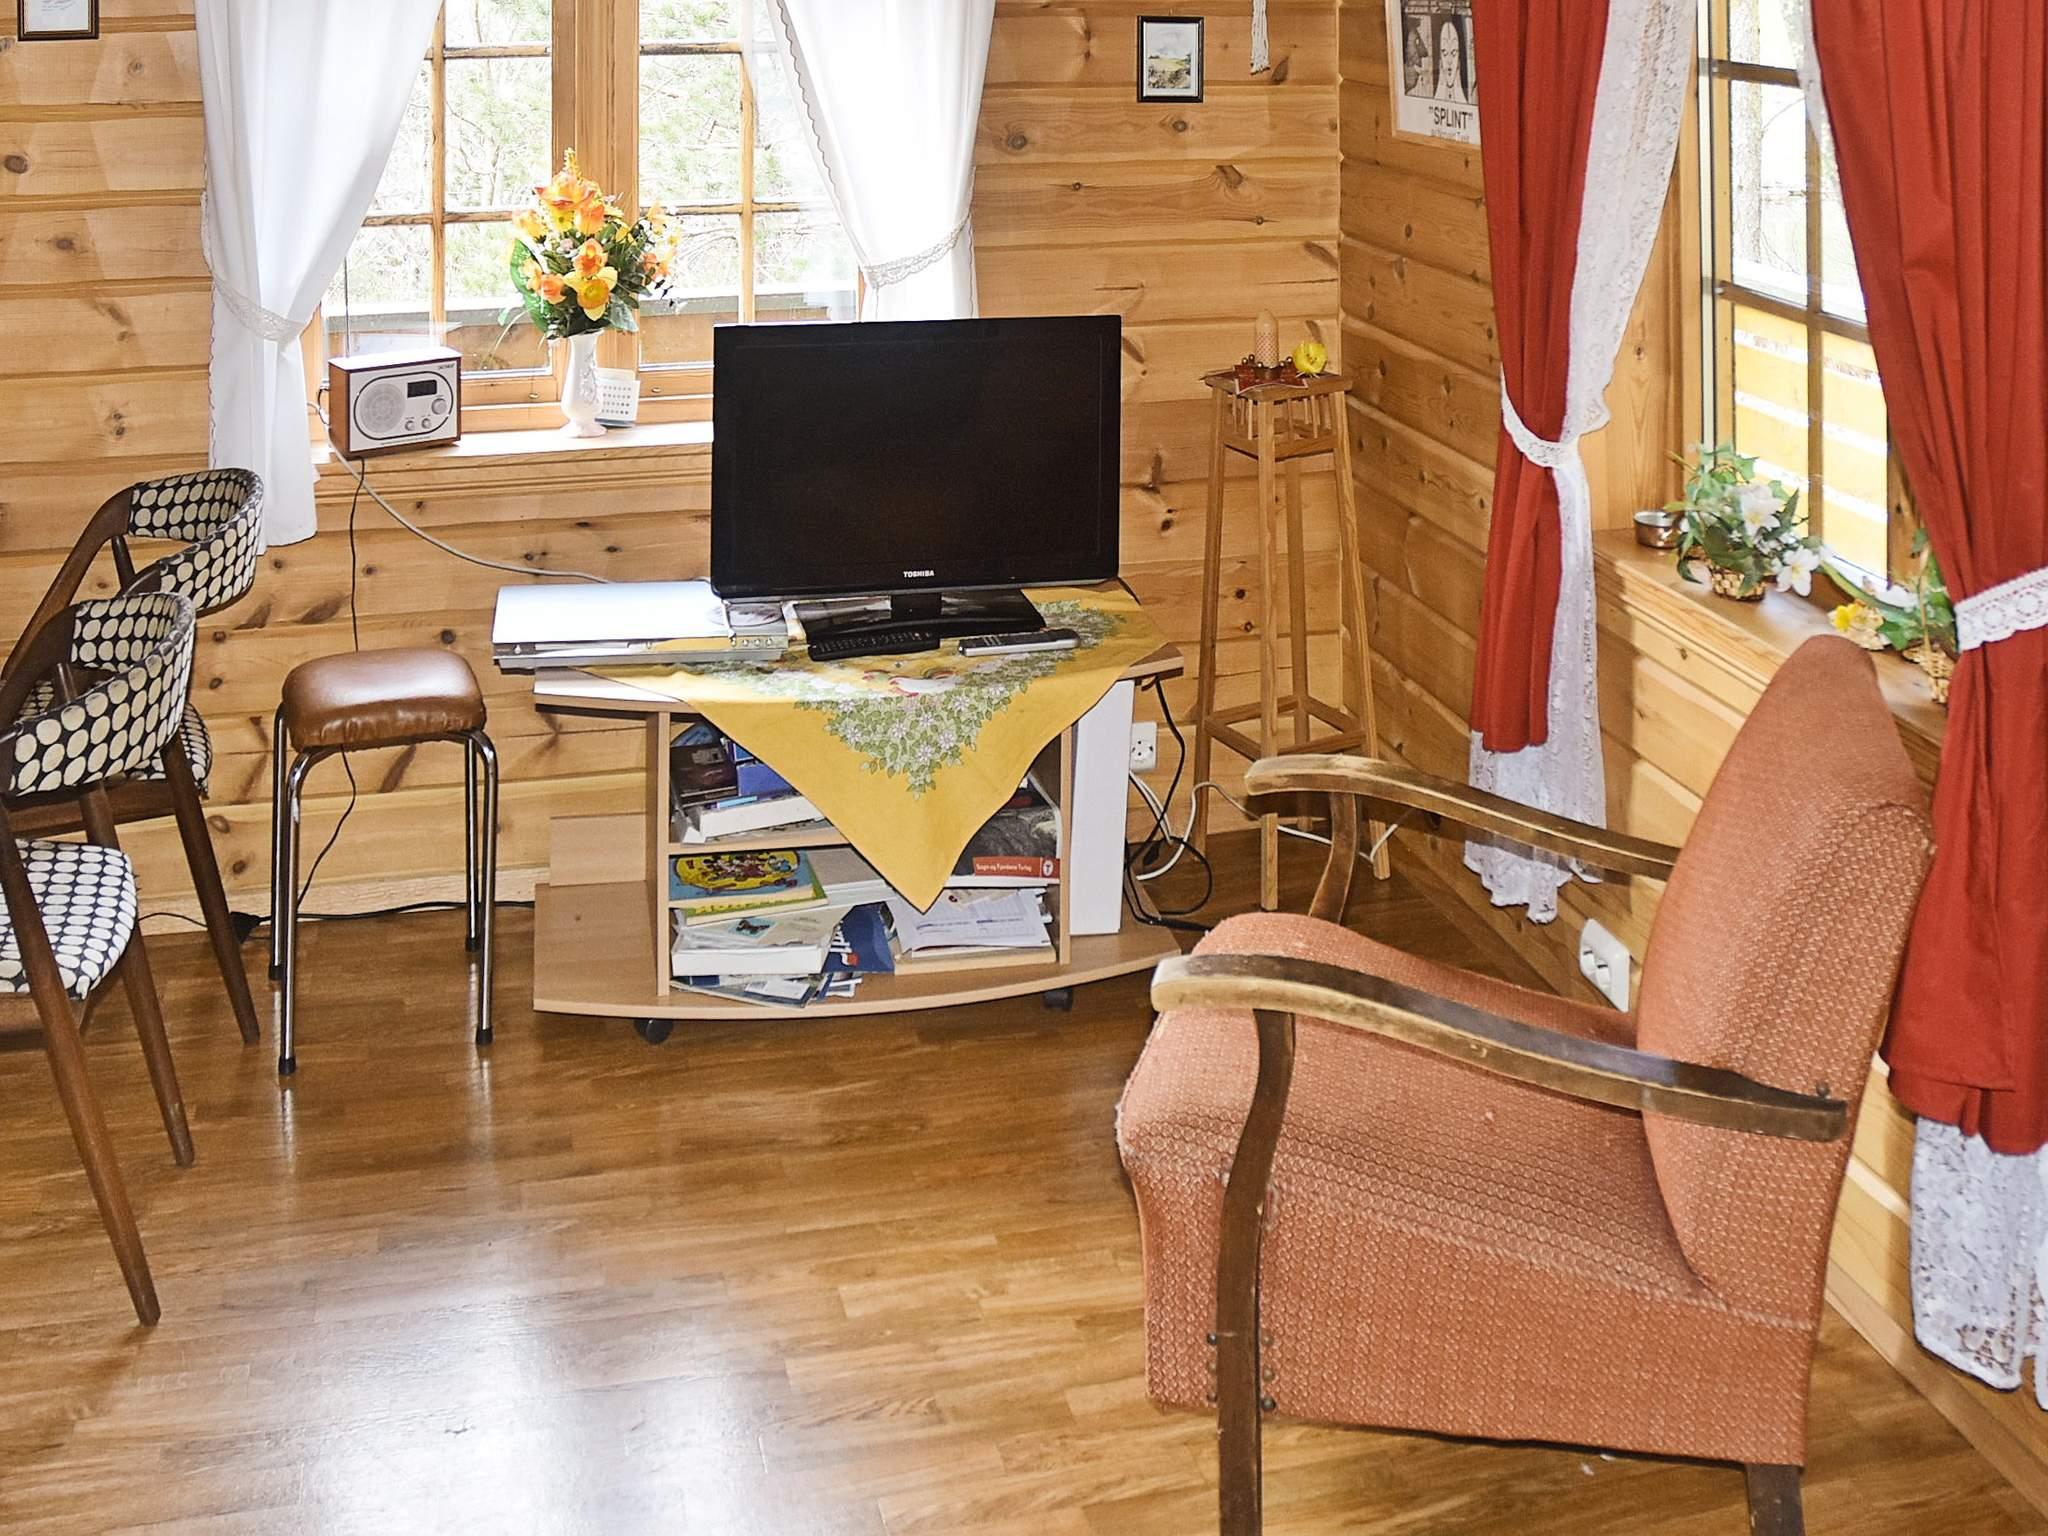 Ferienhaus Helle (82342), Naustdal, Sognefjord - Nordfjord, Westnorwegen, Norwegen, Bild 5